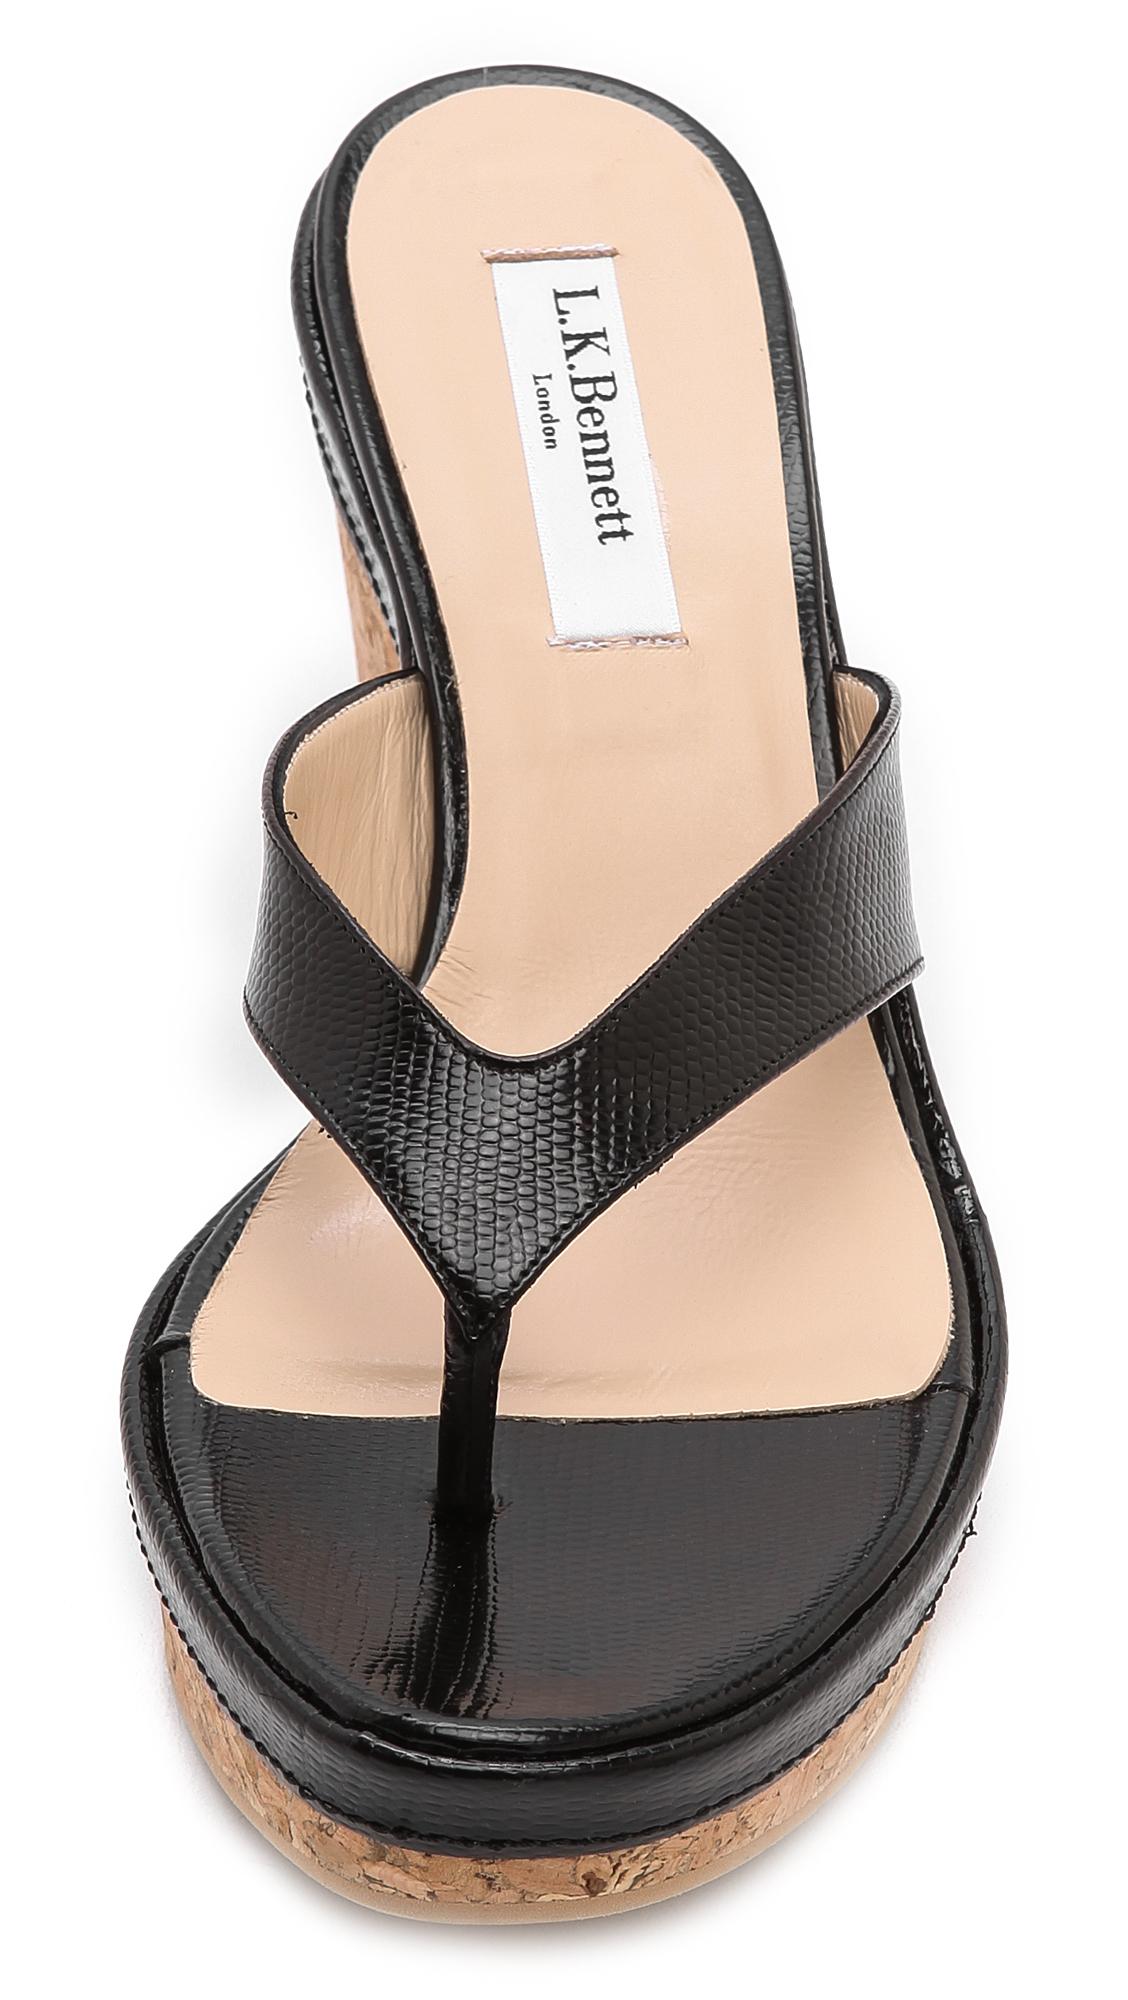 e7c9ff1caaabf L.K. Bennett Laura Thong Wedge Sandals